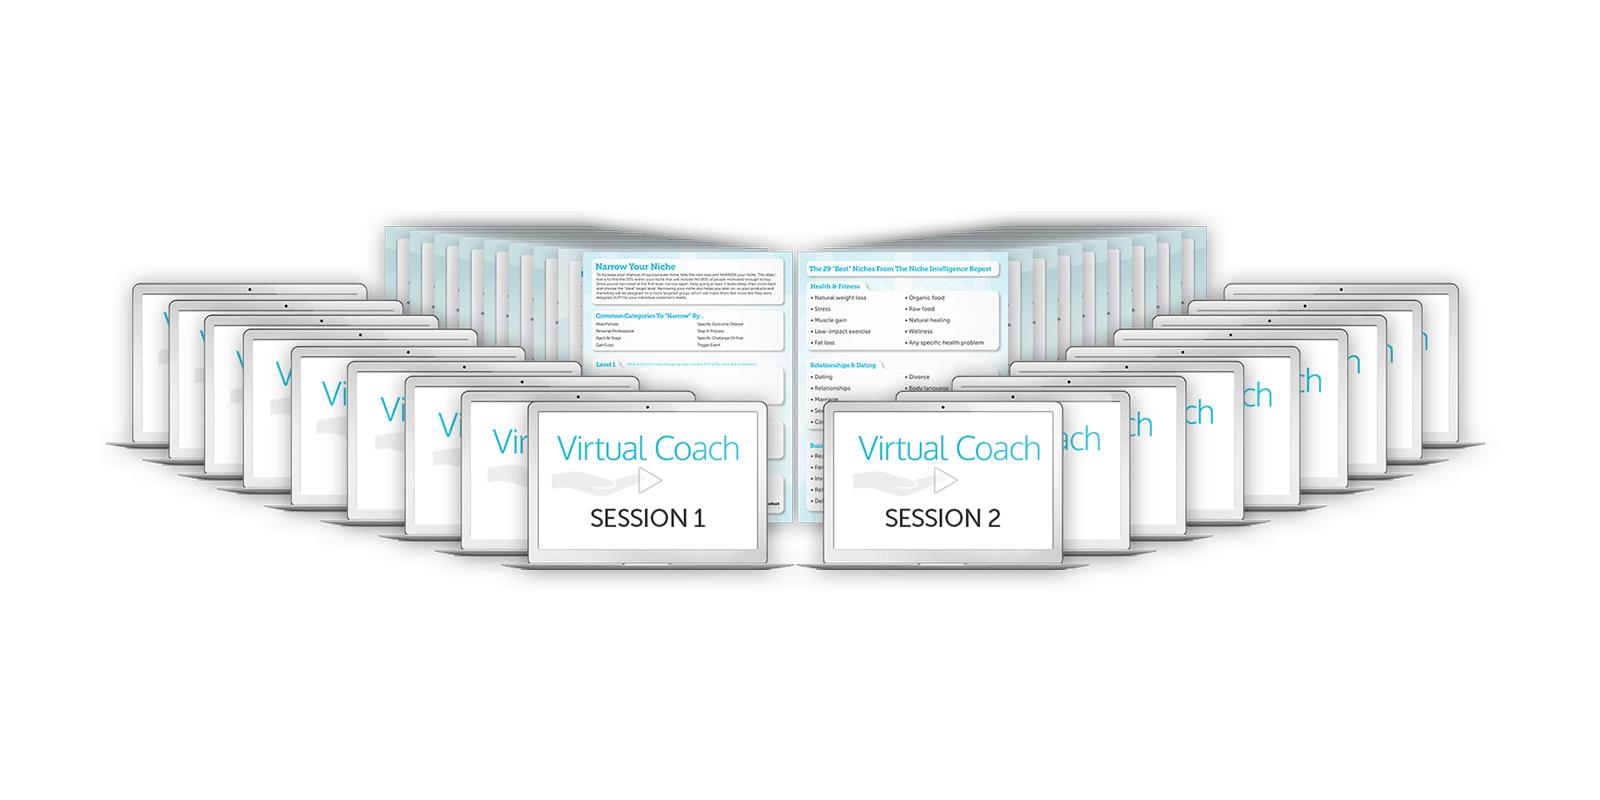 Reviews on virtual coaches